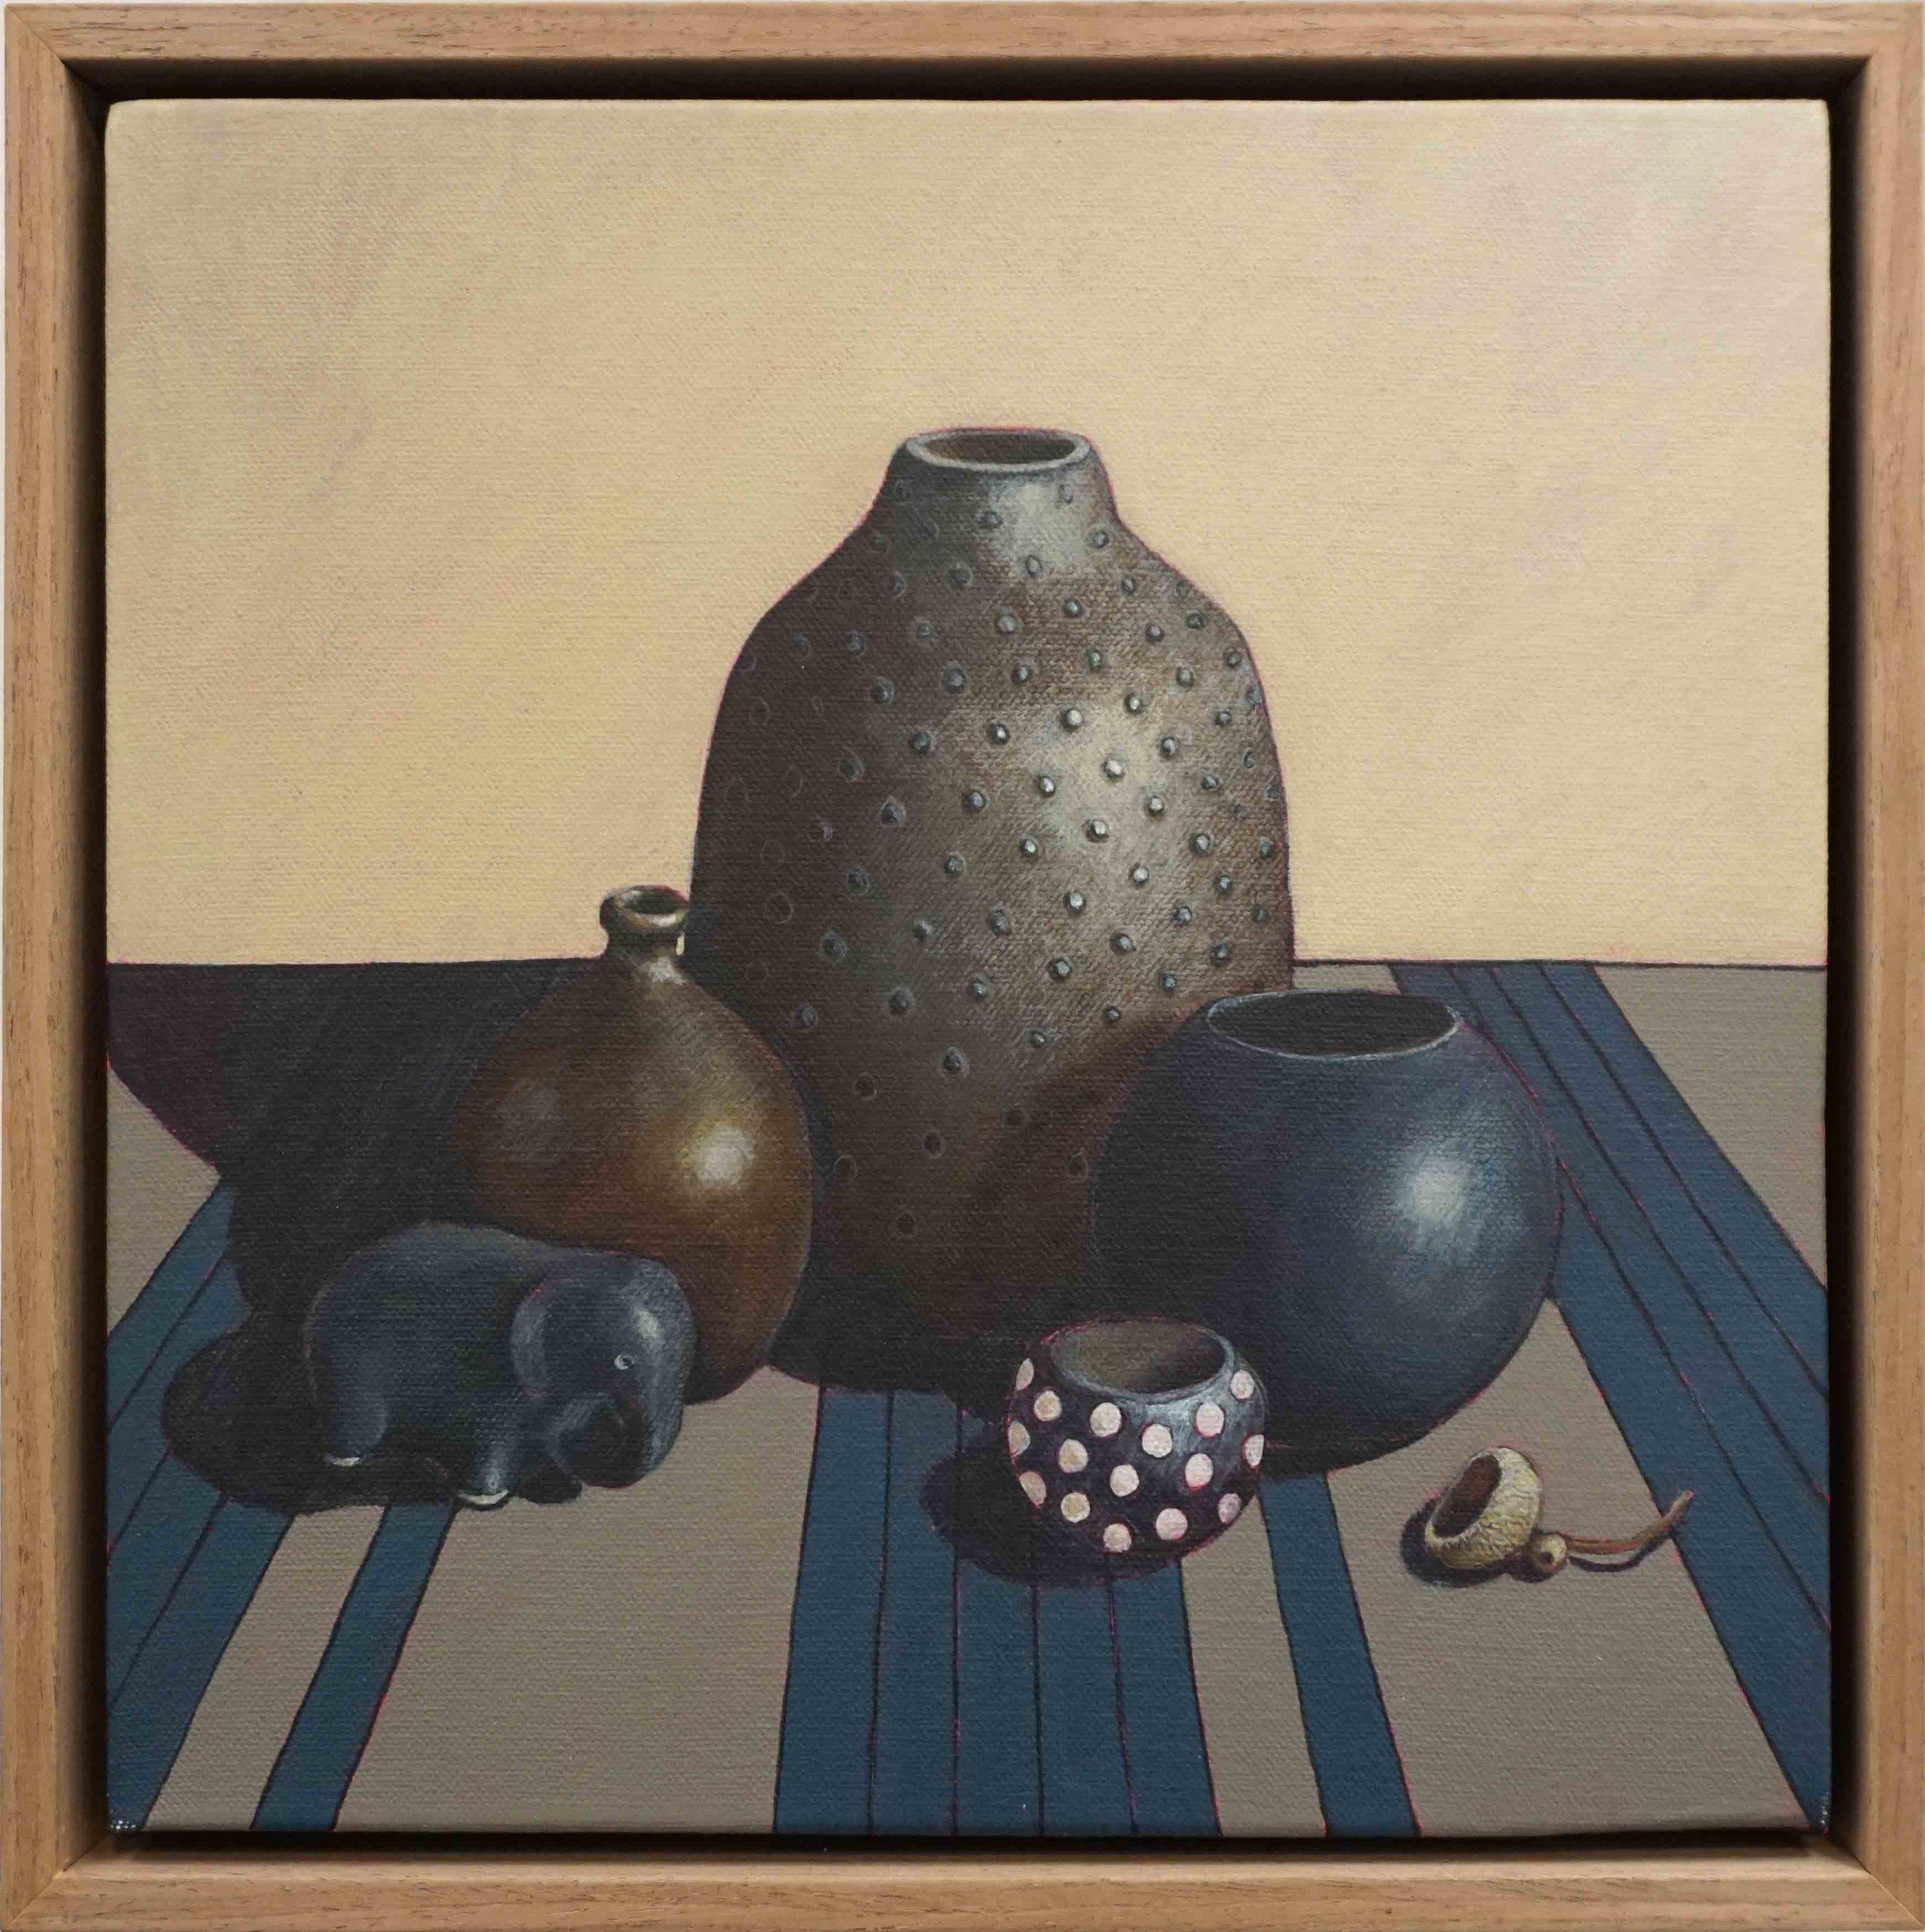 14. Sue Eva, 'African Feel', 2018, Acrylic on canvas, 30 x 30cm, $445